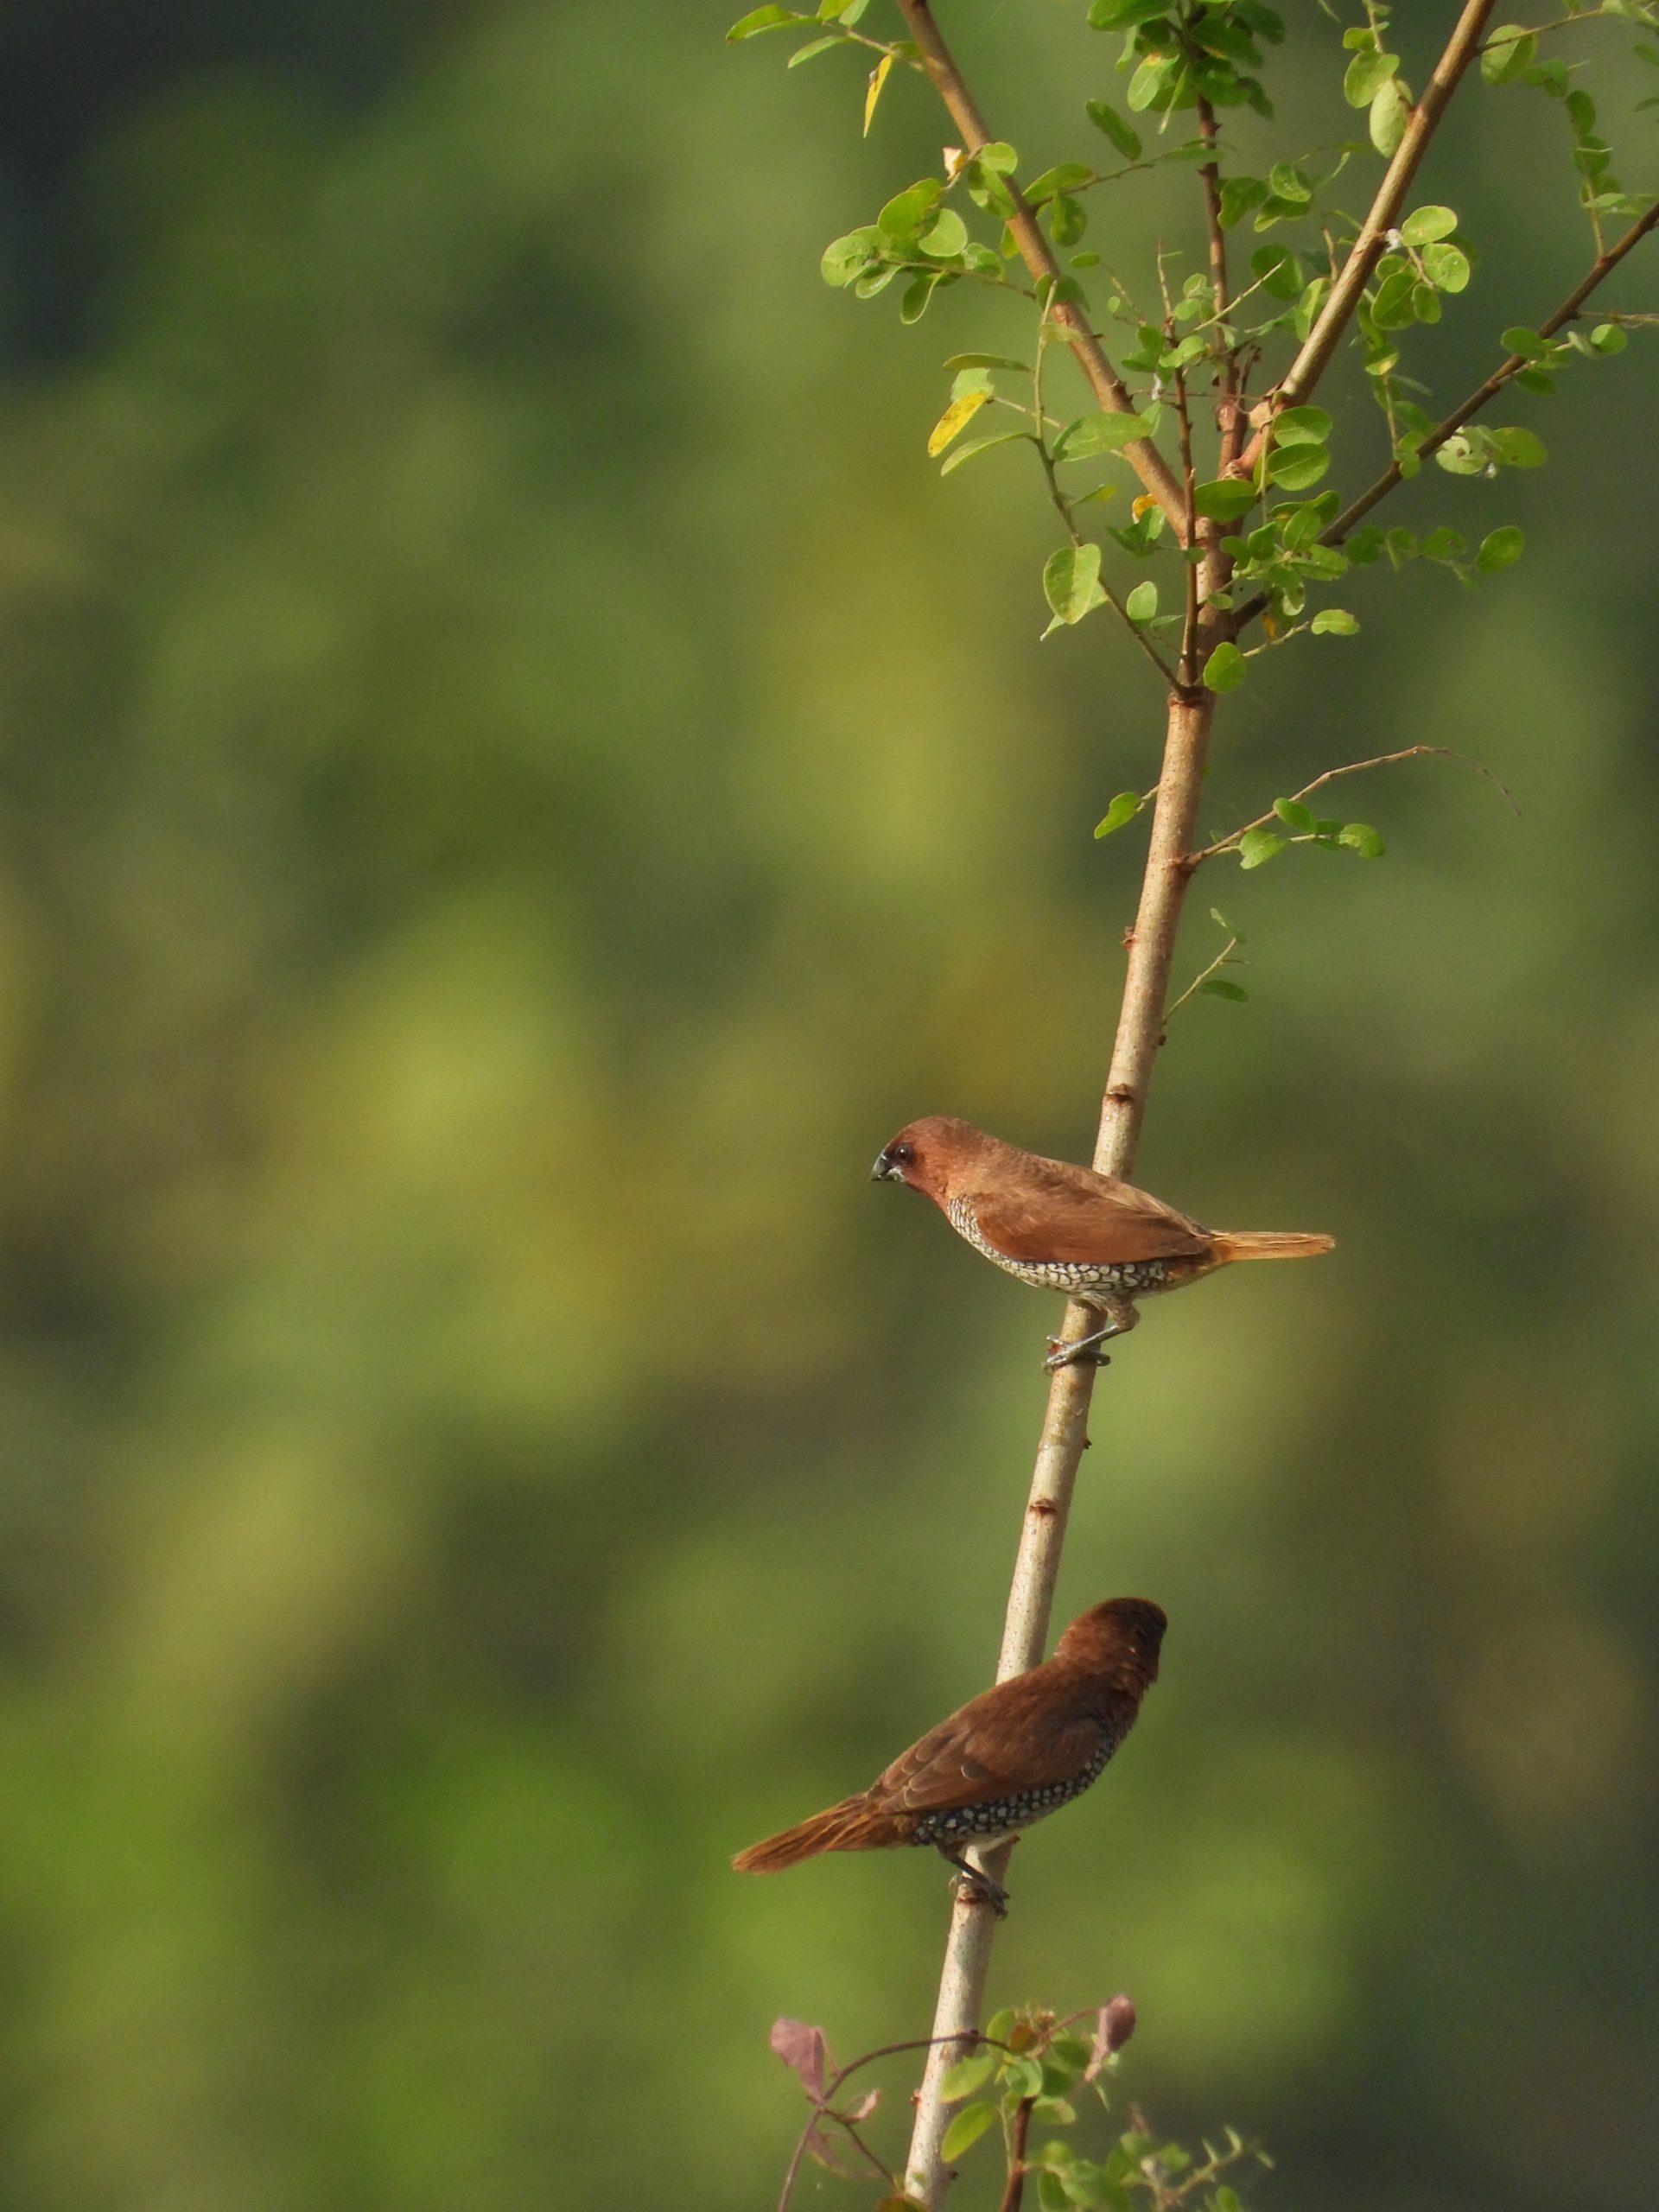 Birds sitting on a stem